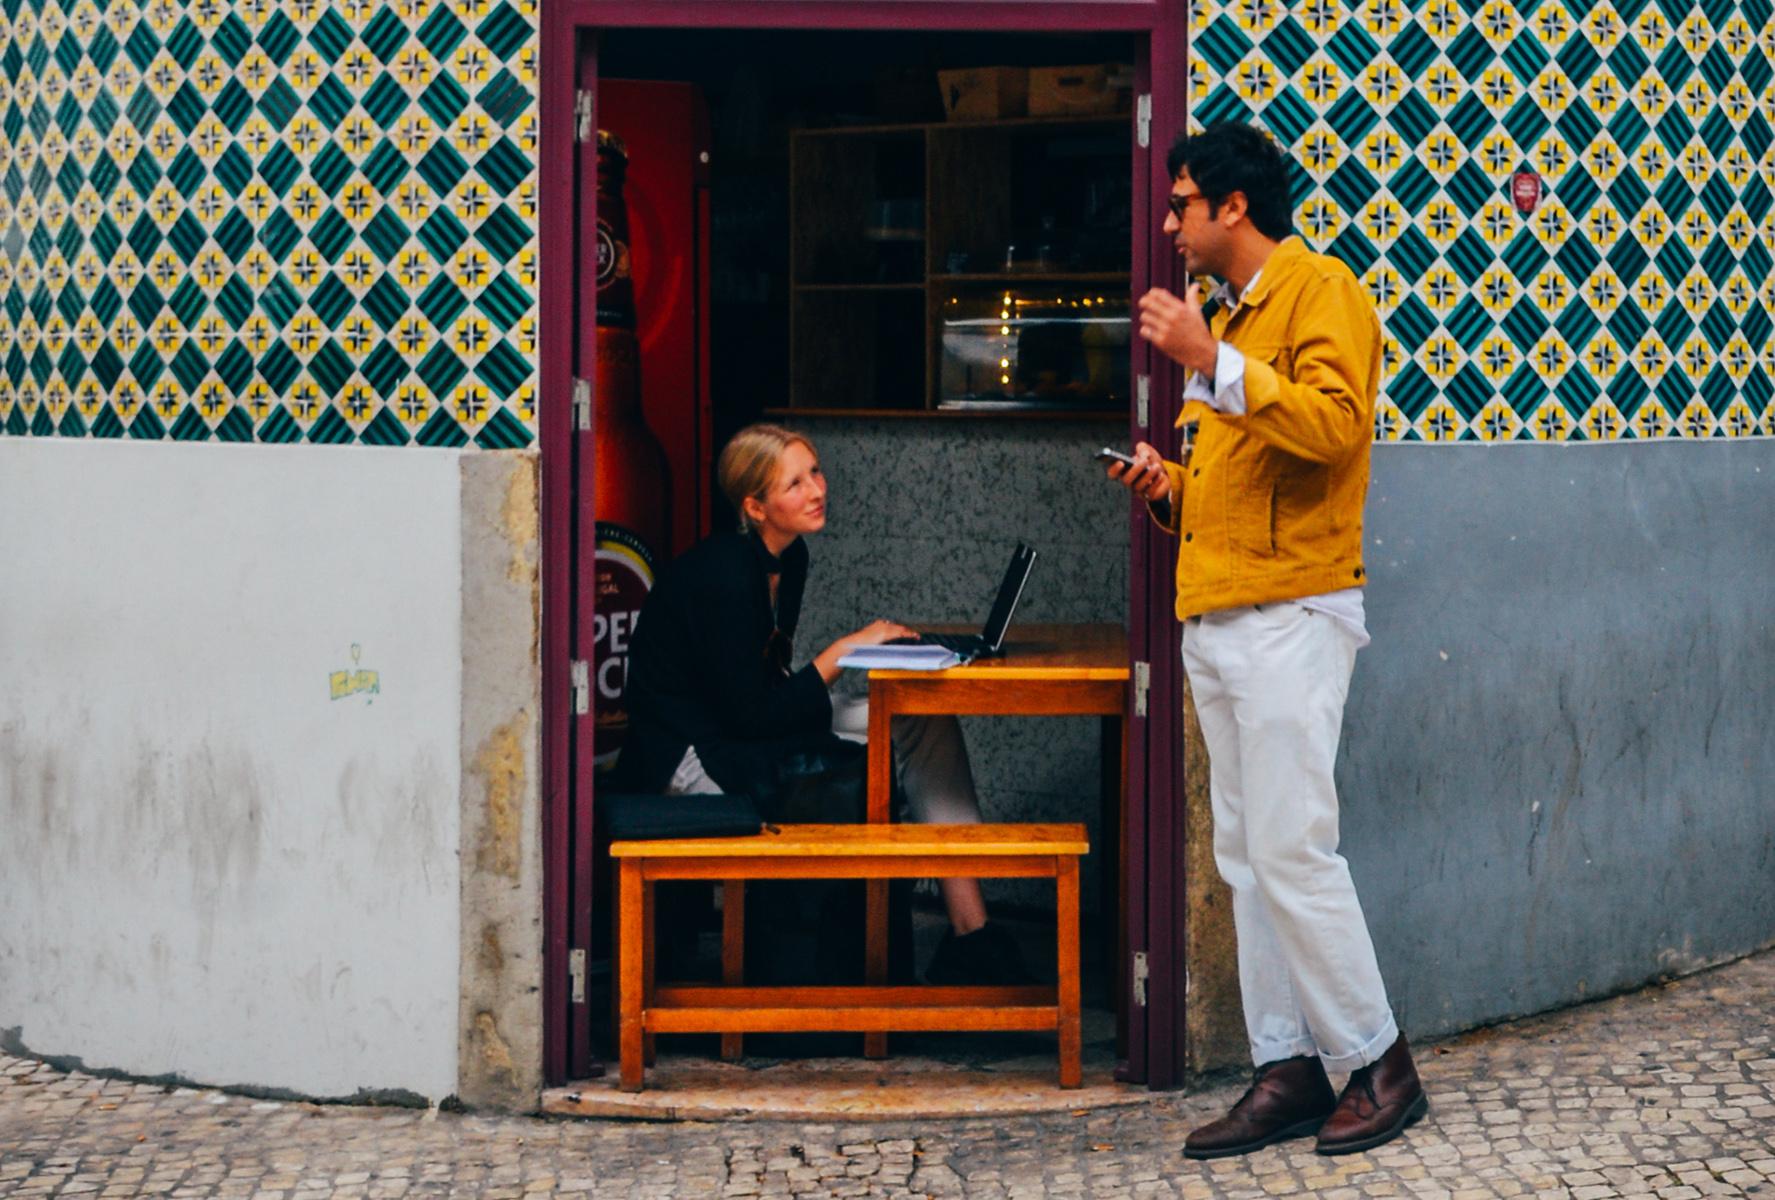 Woman working in a Lisbon café